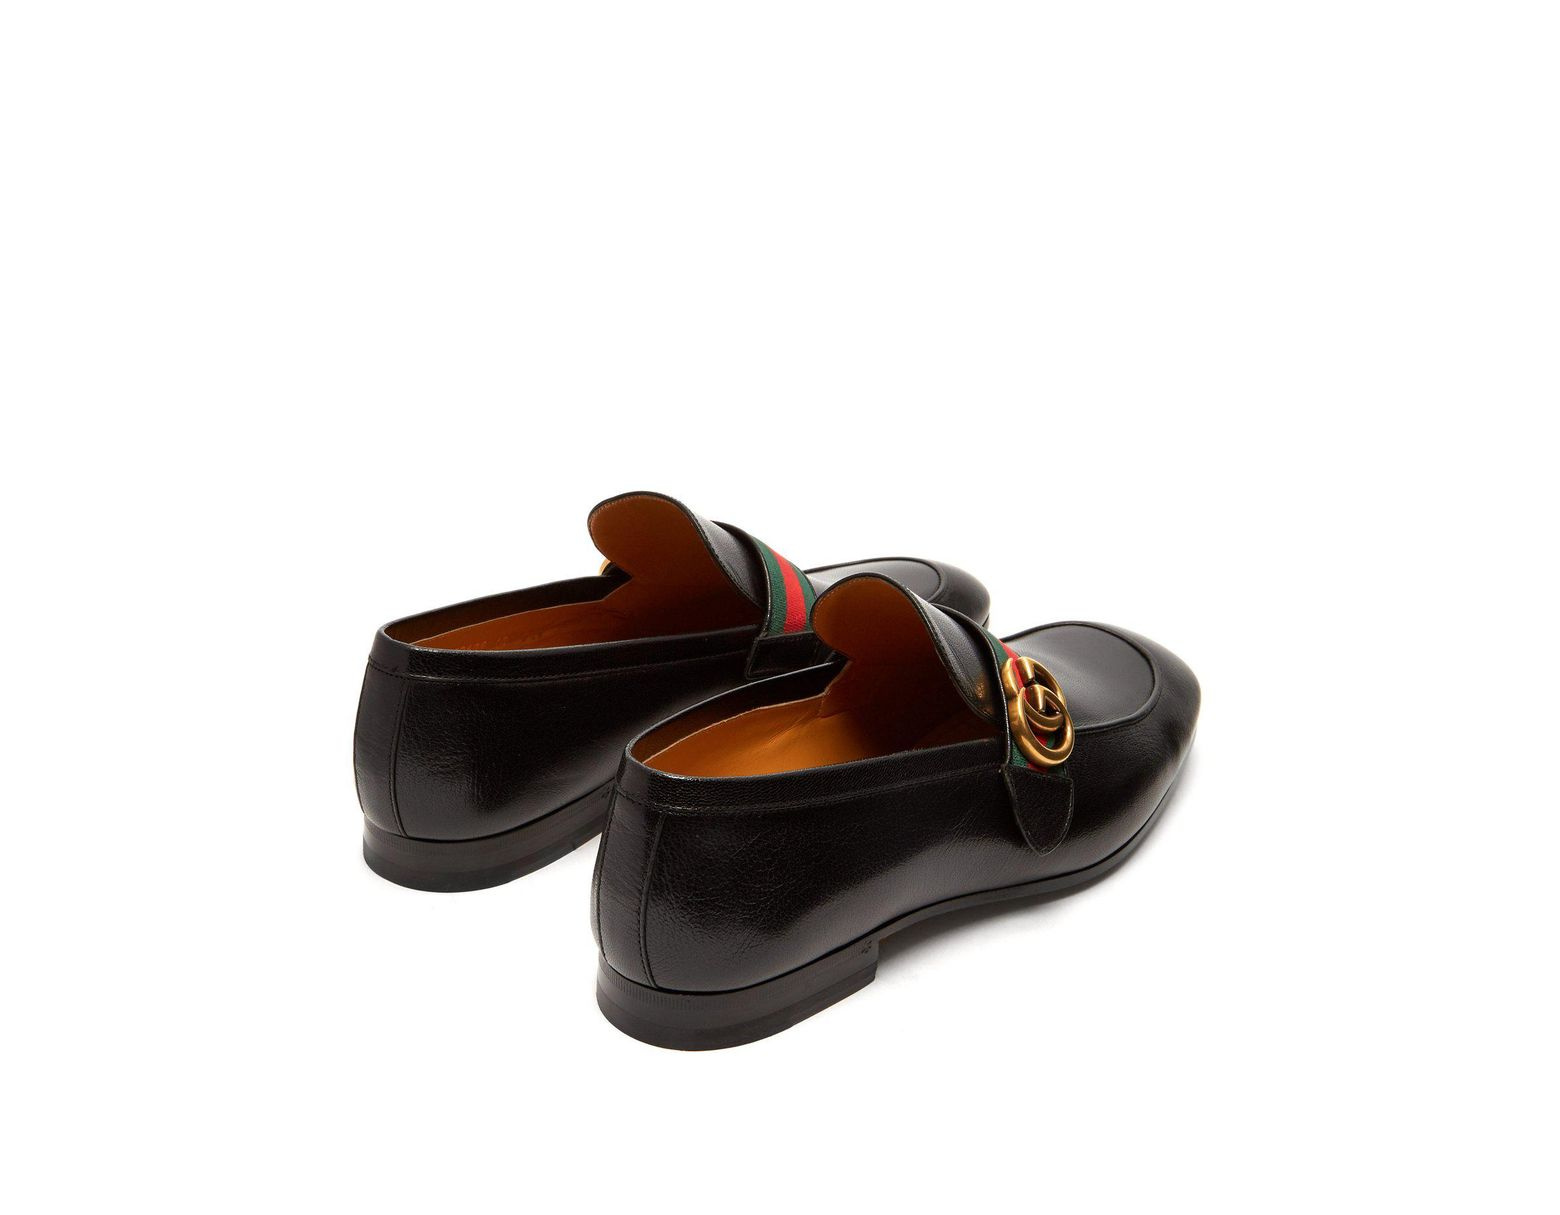 e3e683d0664 Lyst - Gucci Donnie Gg Web Stripe Leather Loafers in Black for Men - Save 5%